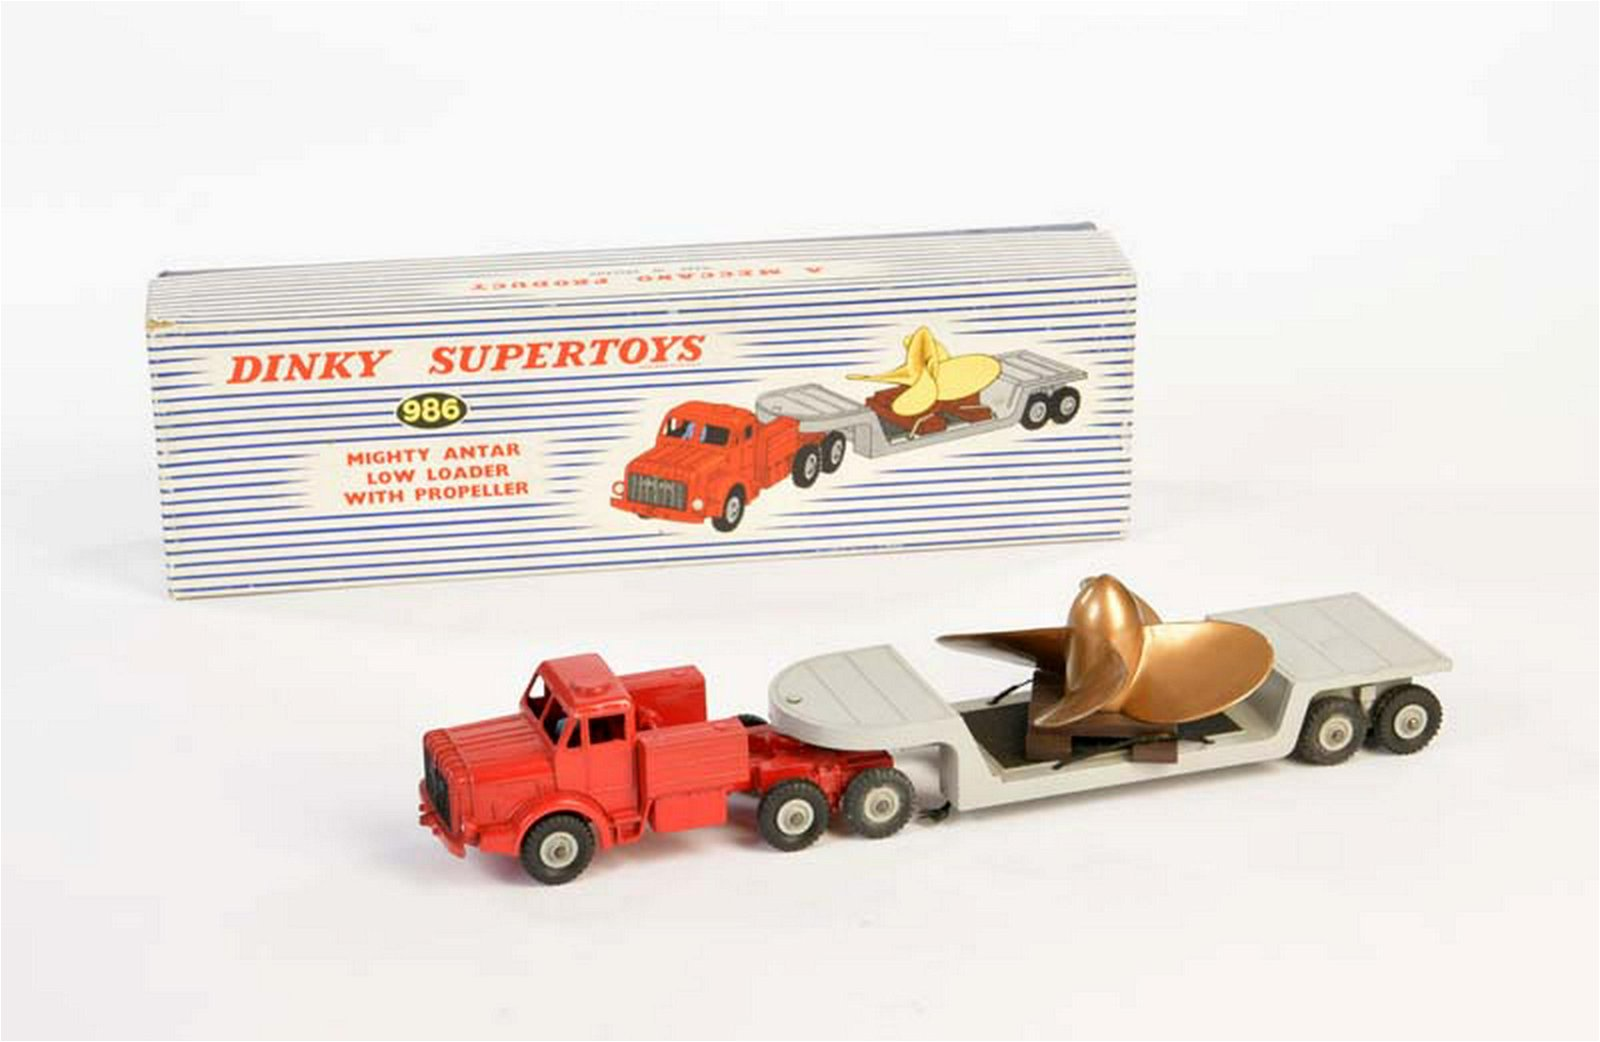 Dinky Toys, Mighty Antar - Tieflader mit Propeller